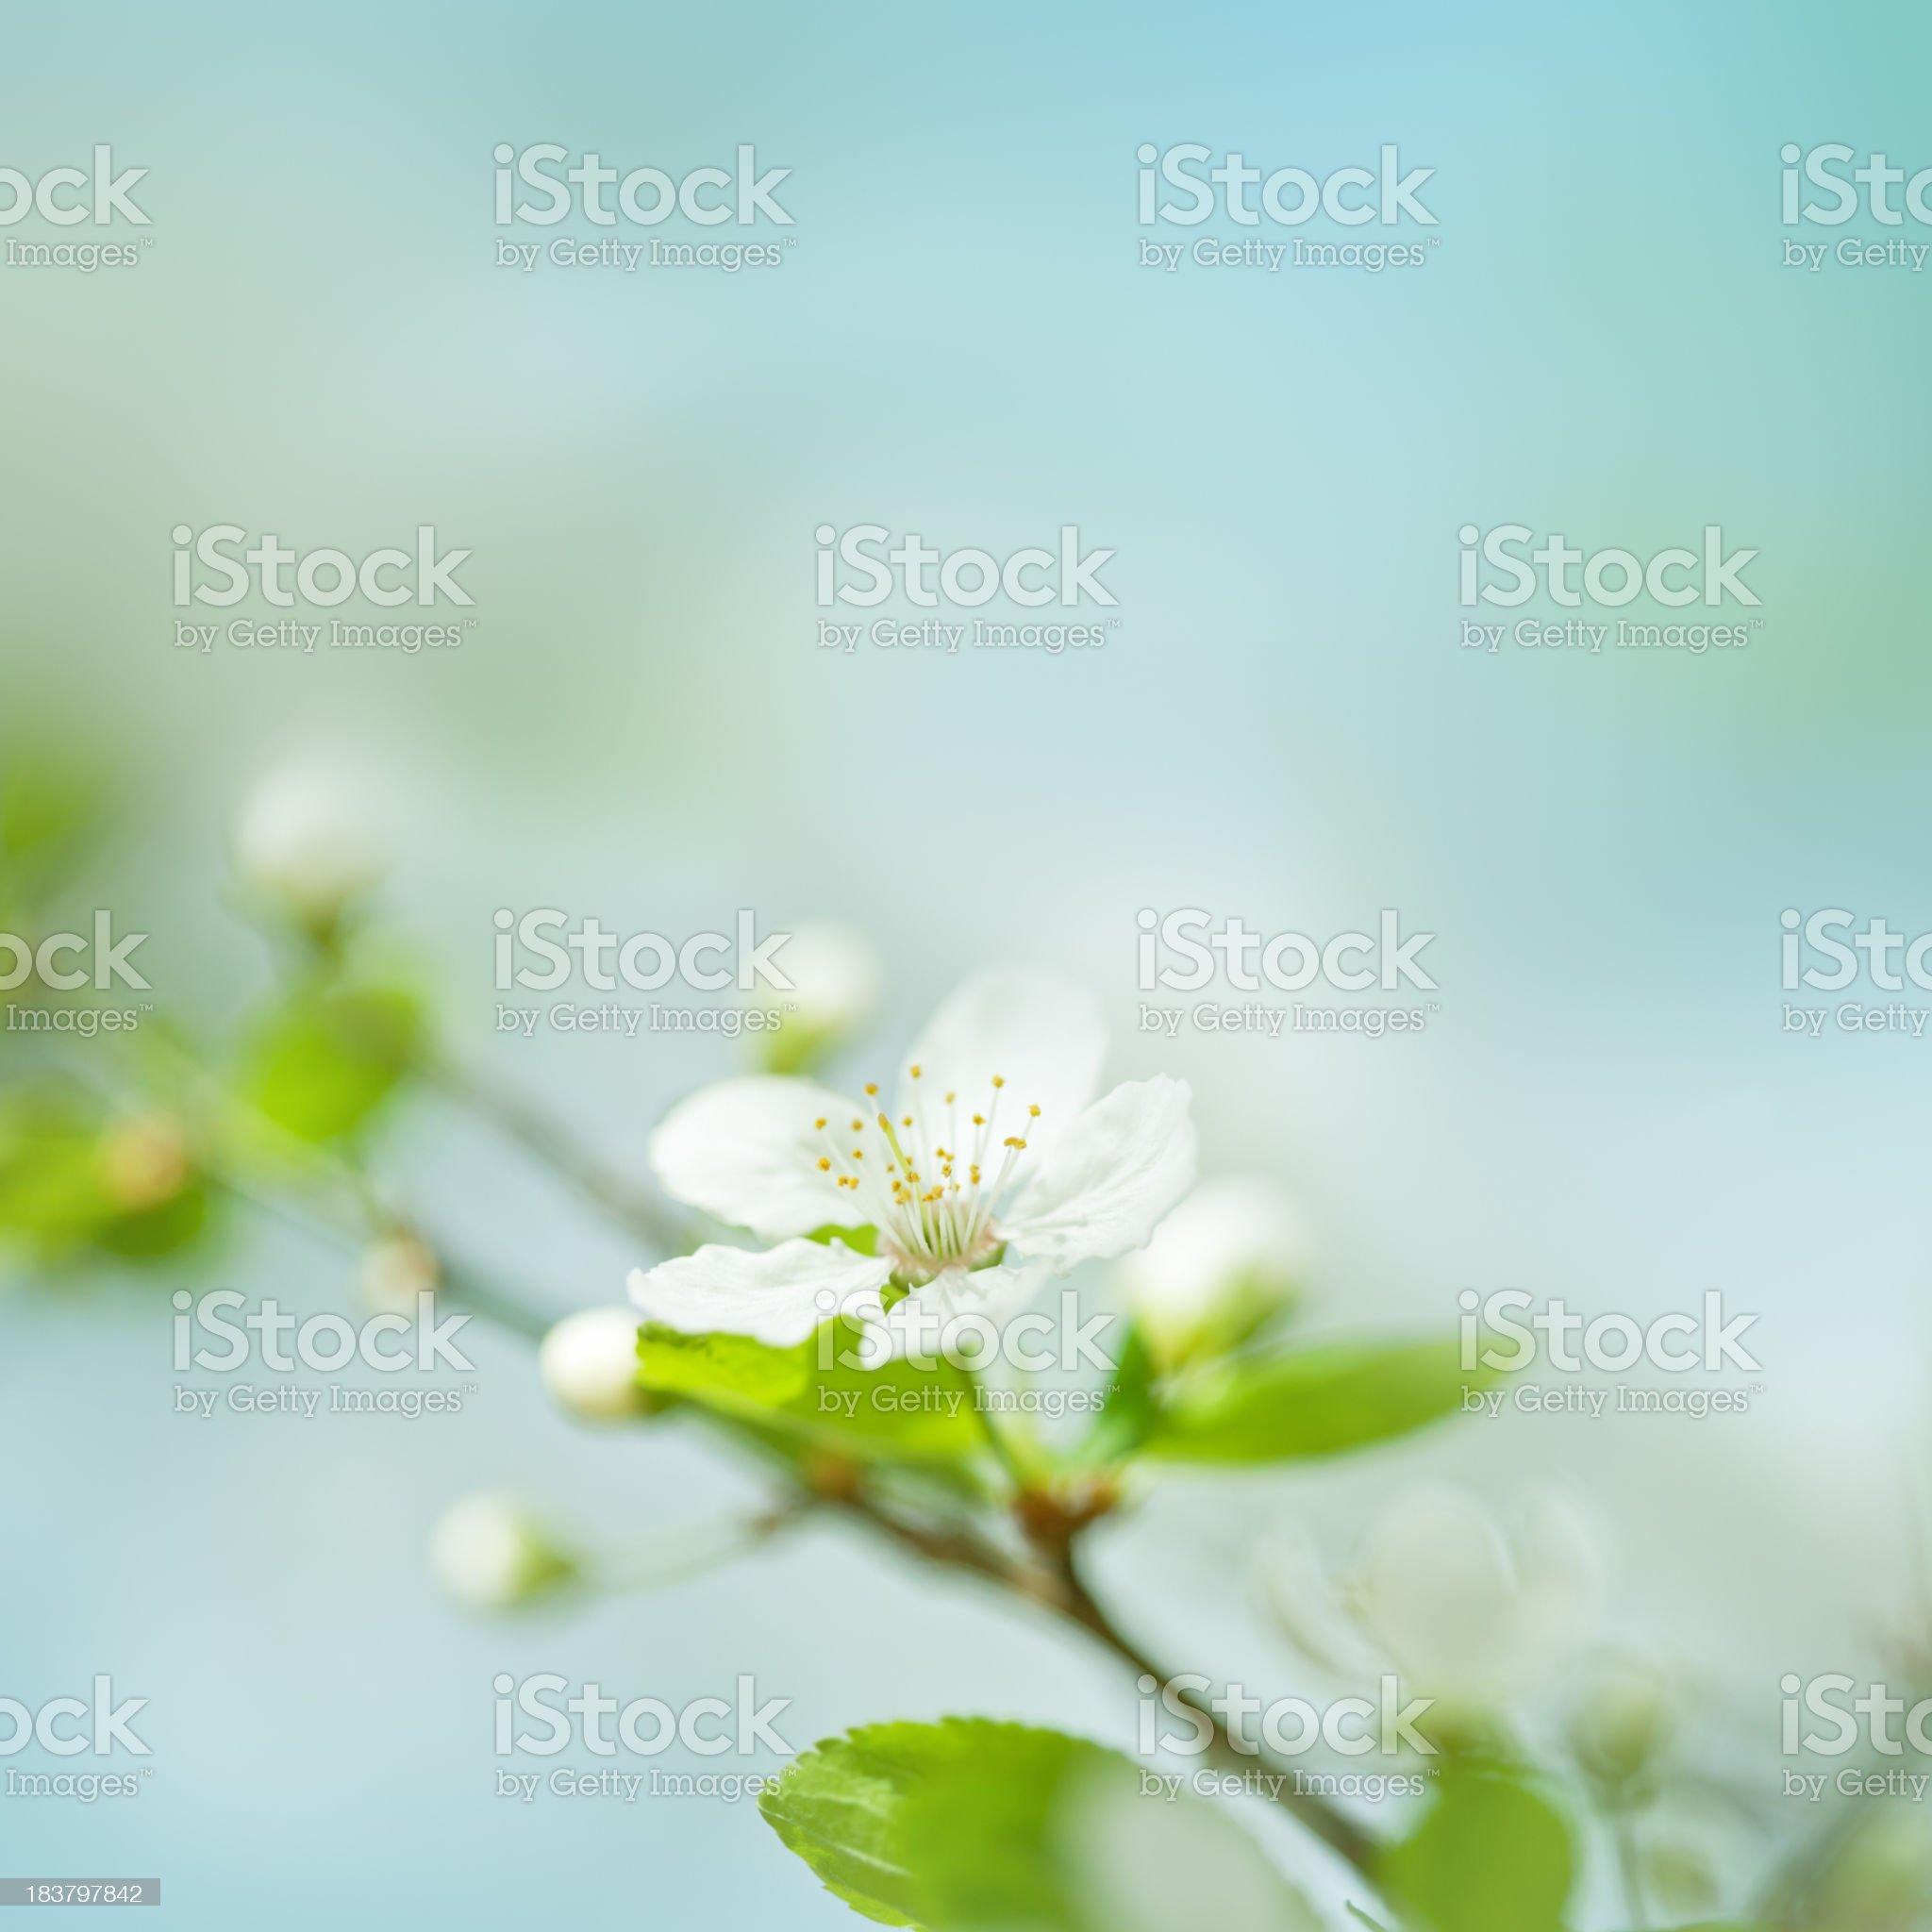 Little plum blossom on a plum tree royalty-free stock photo